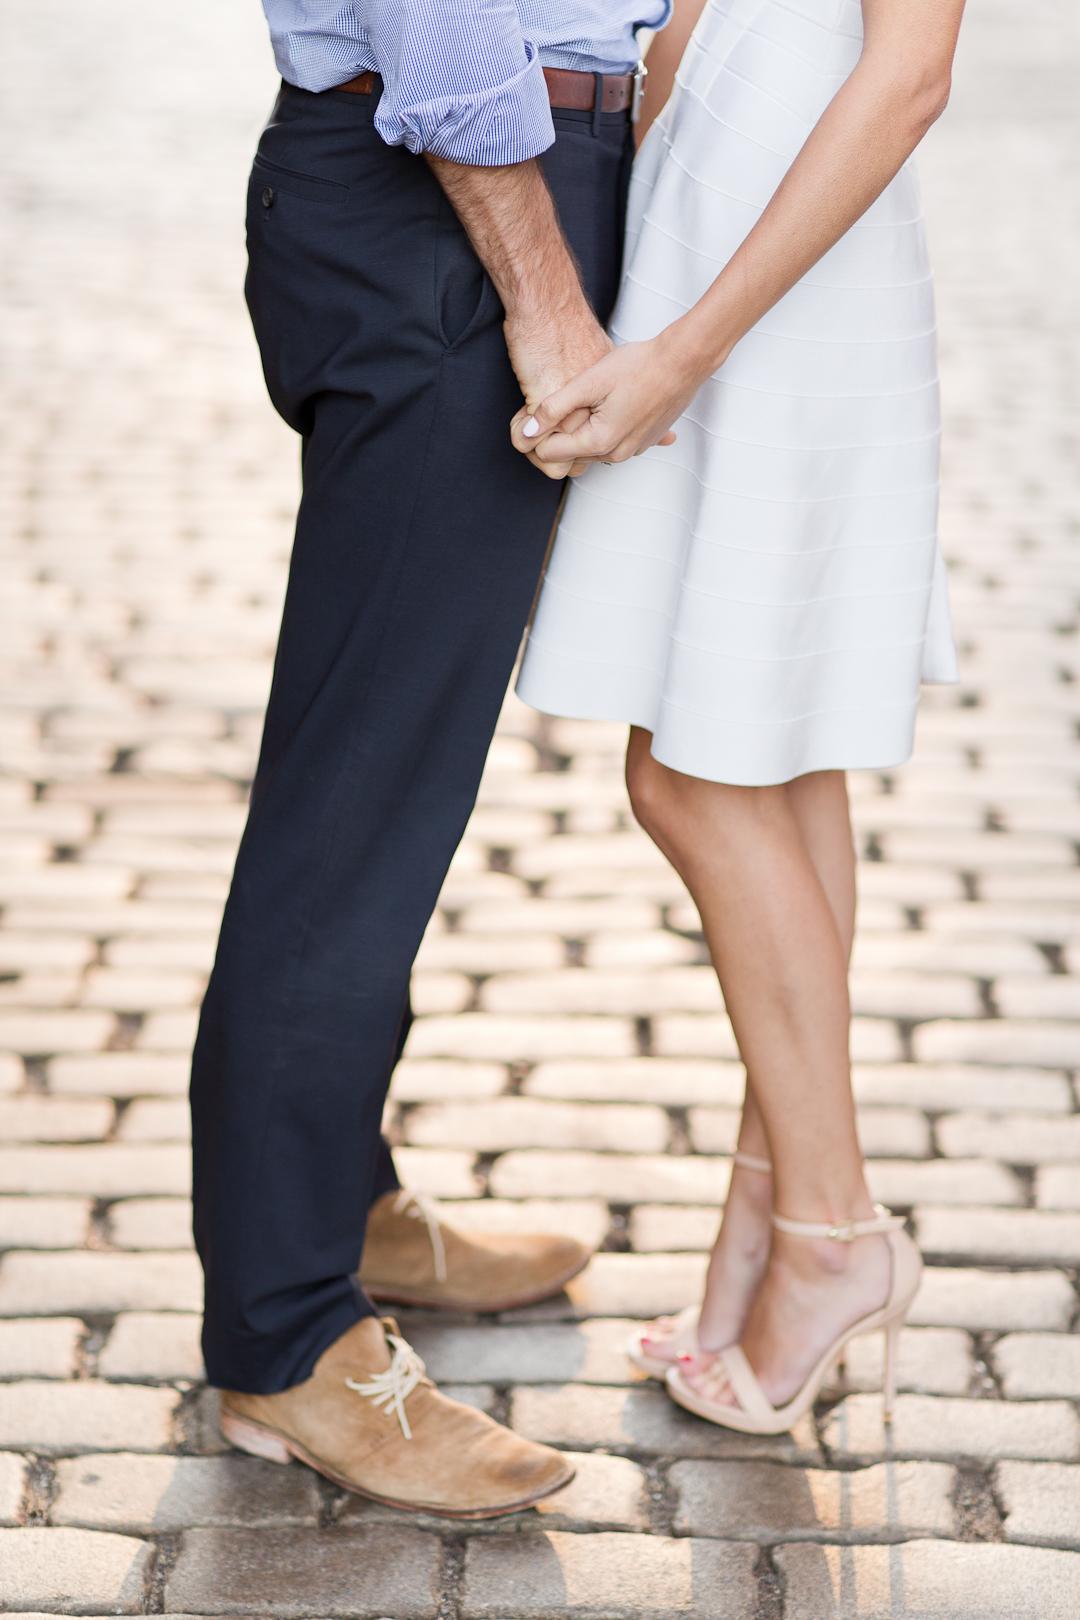 Melissa Kruse Photography - Daniece & Chris West Village Engagement Photos-131.jpg